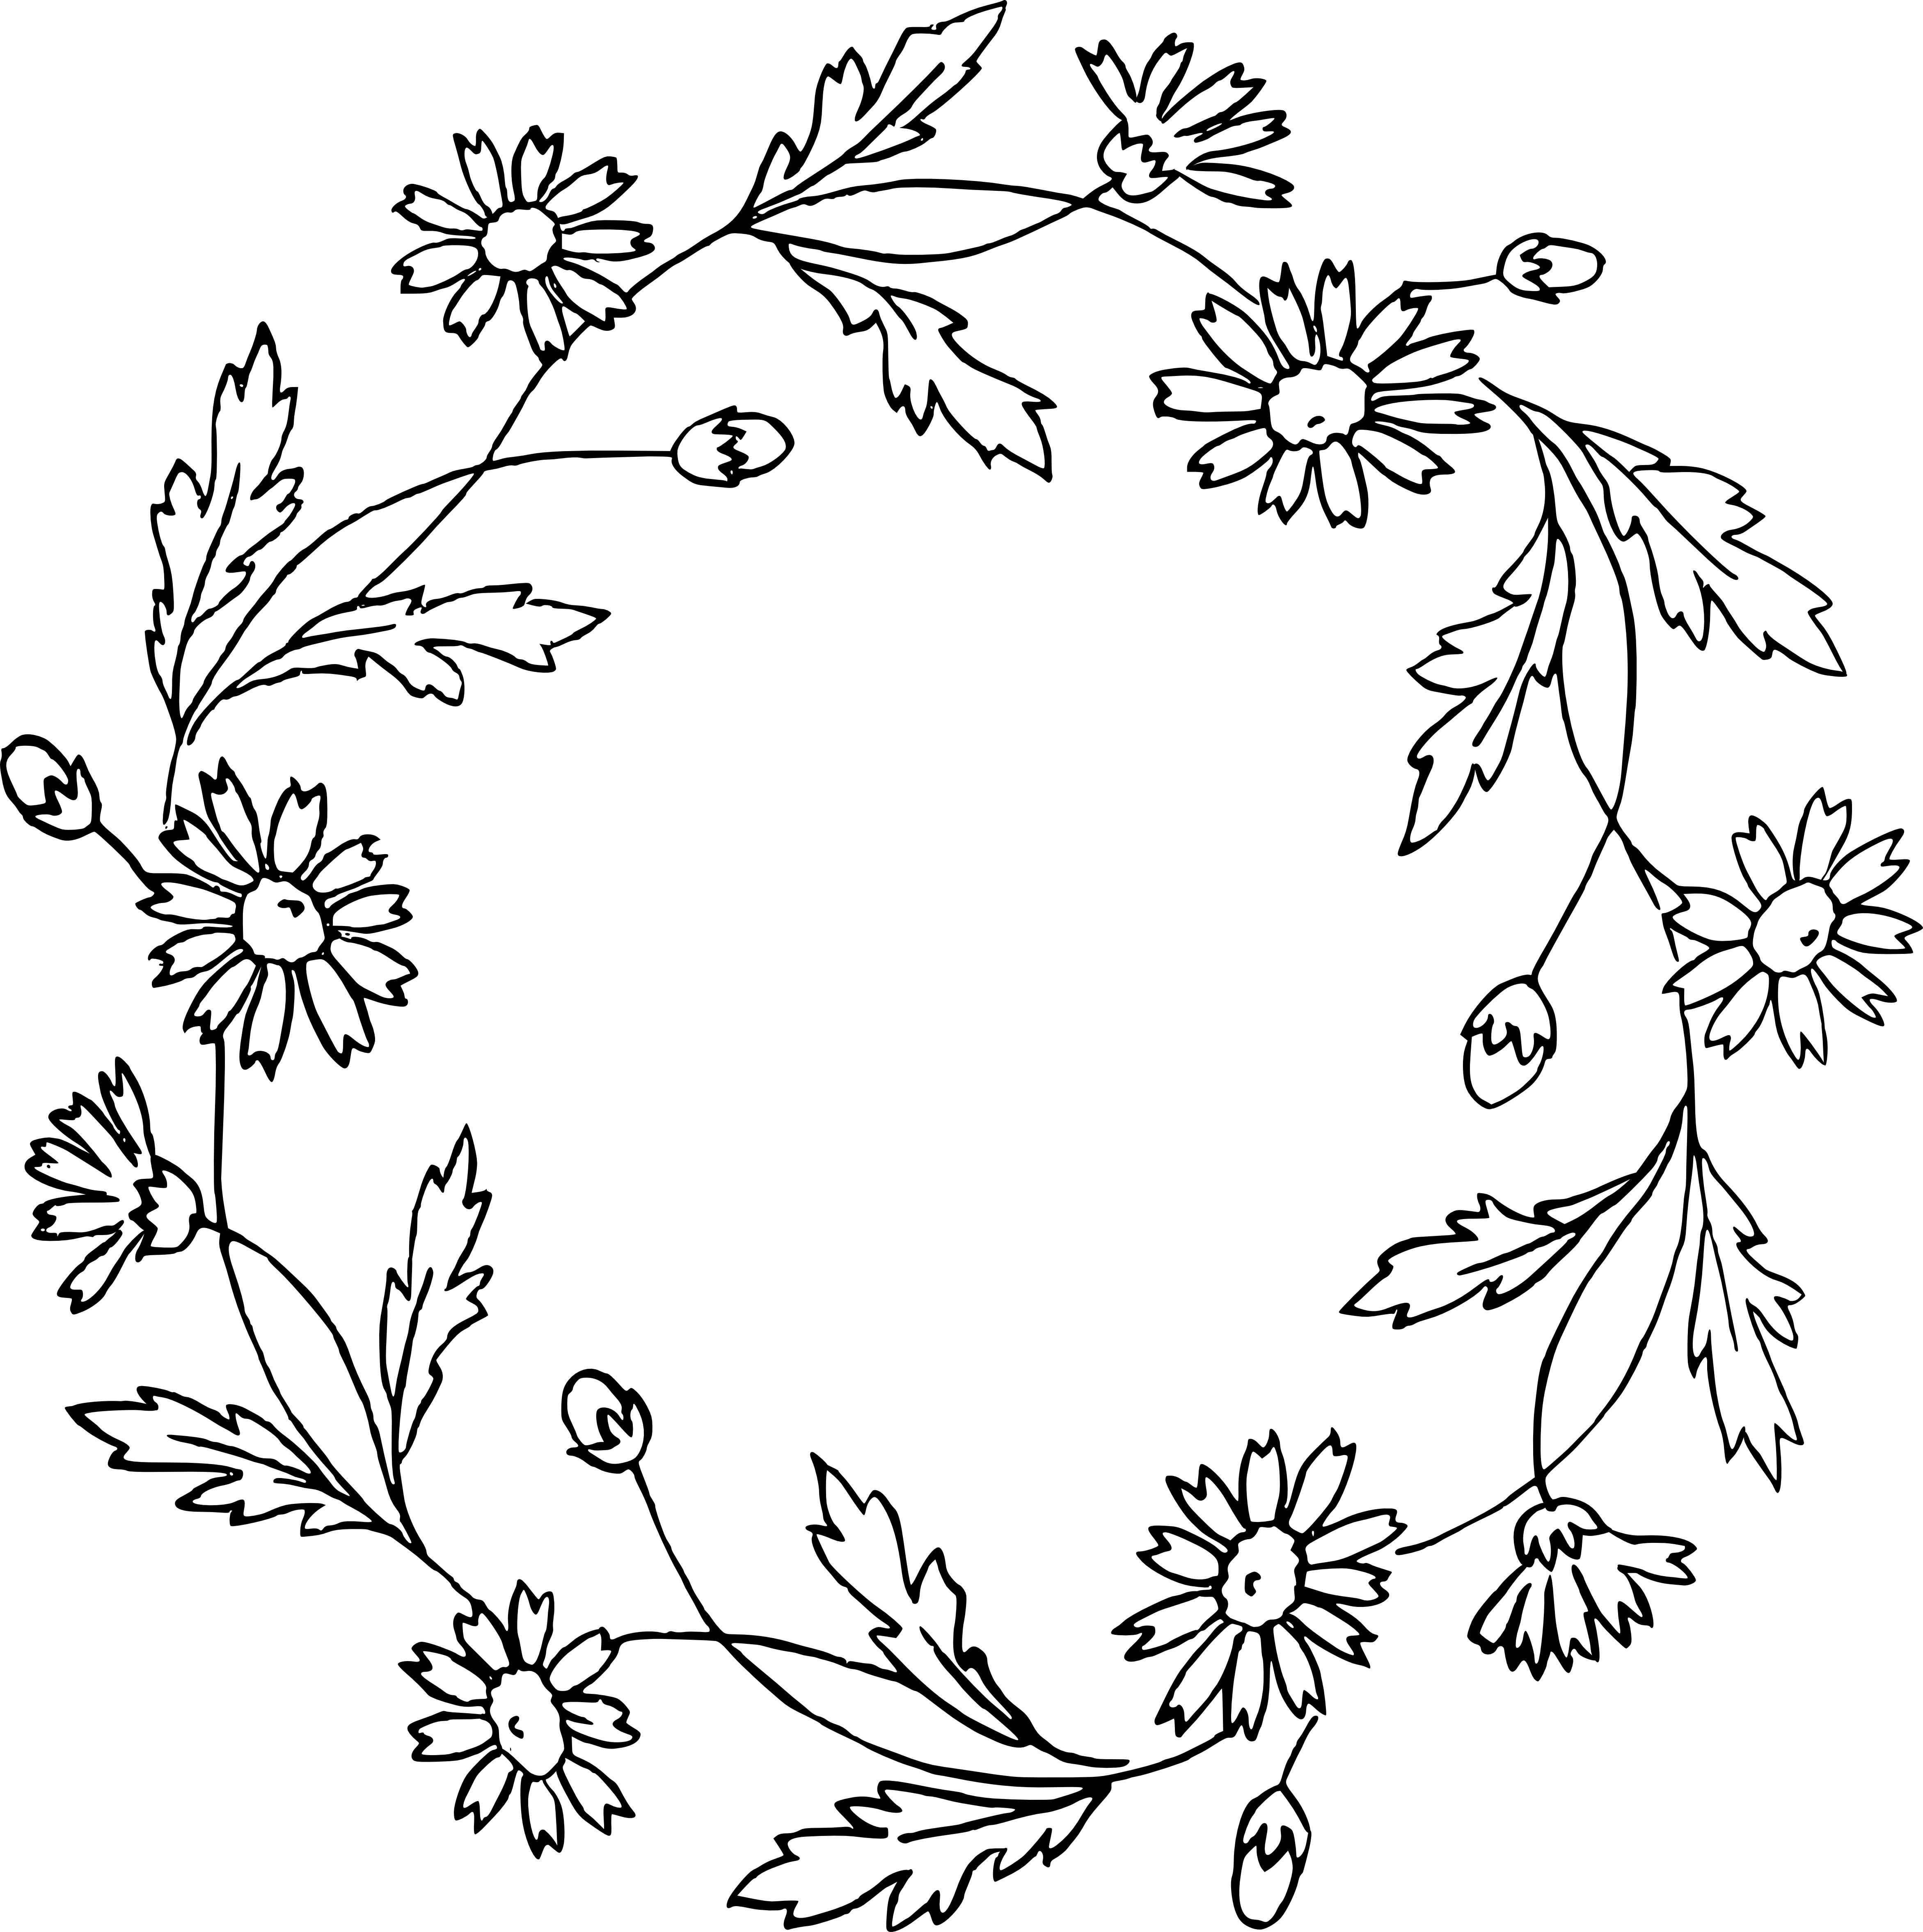 4686x4707 Eleletsitz Transparent Flower Drawing Tumblr Images